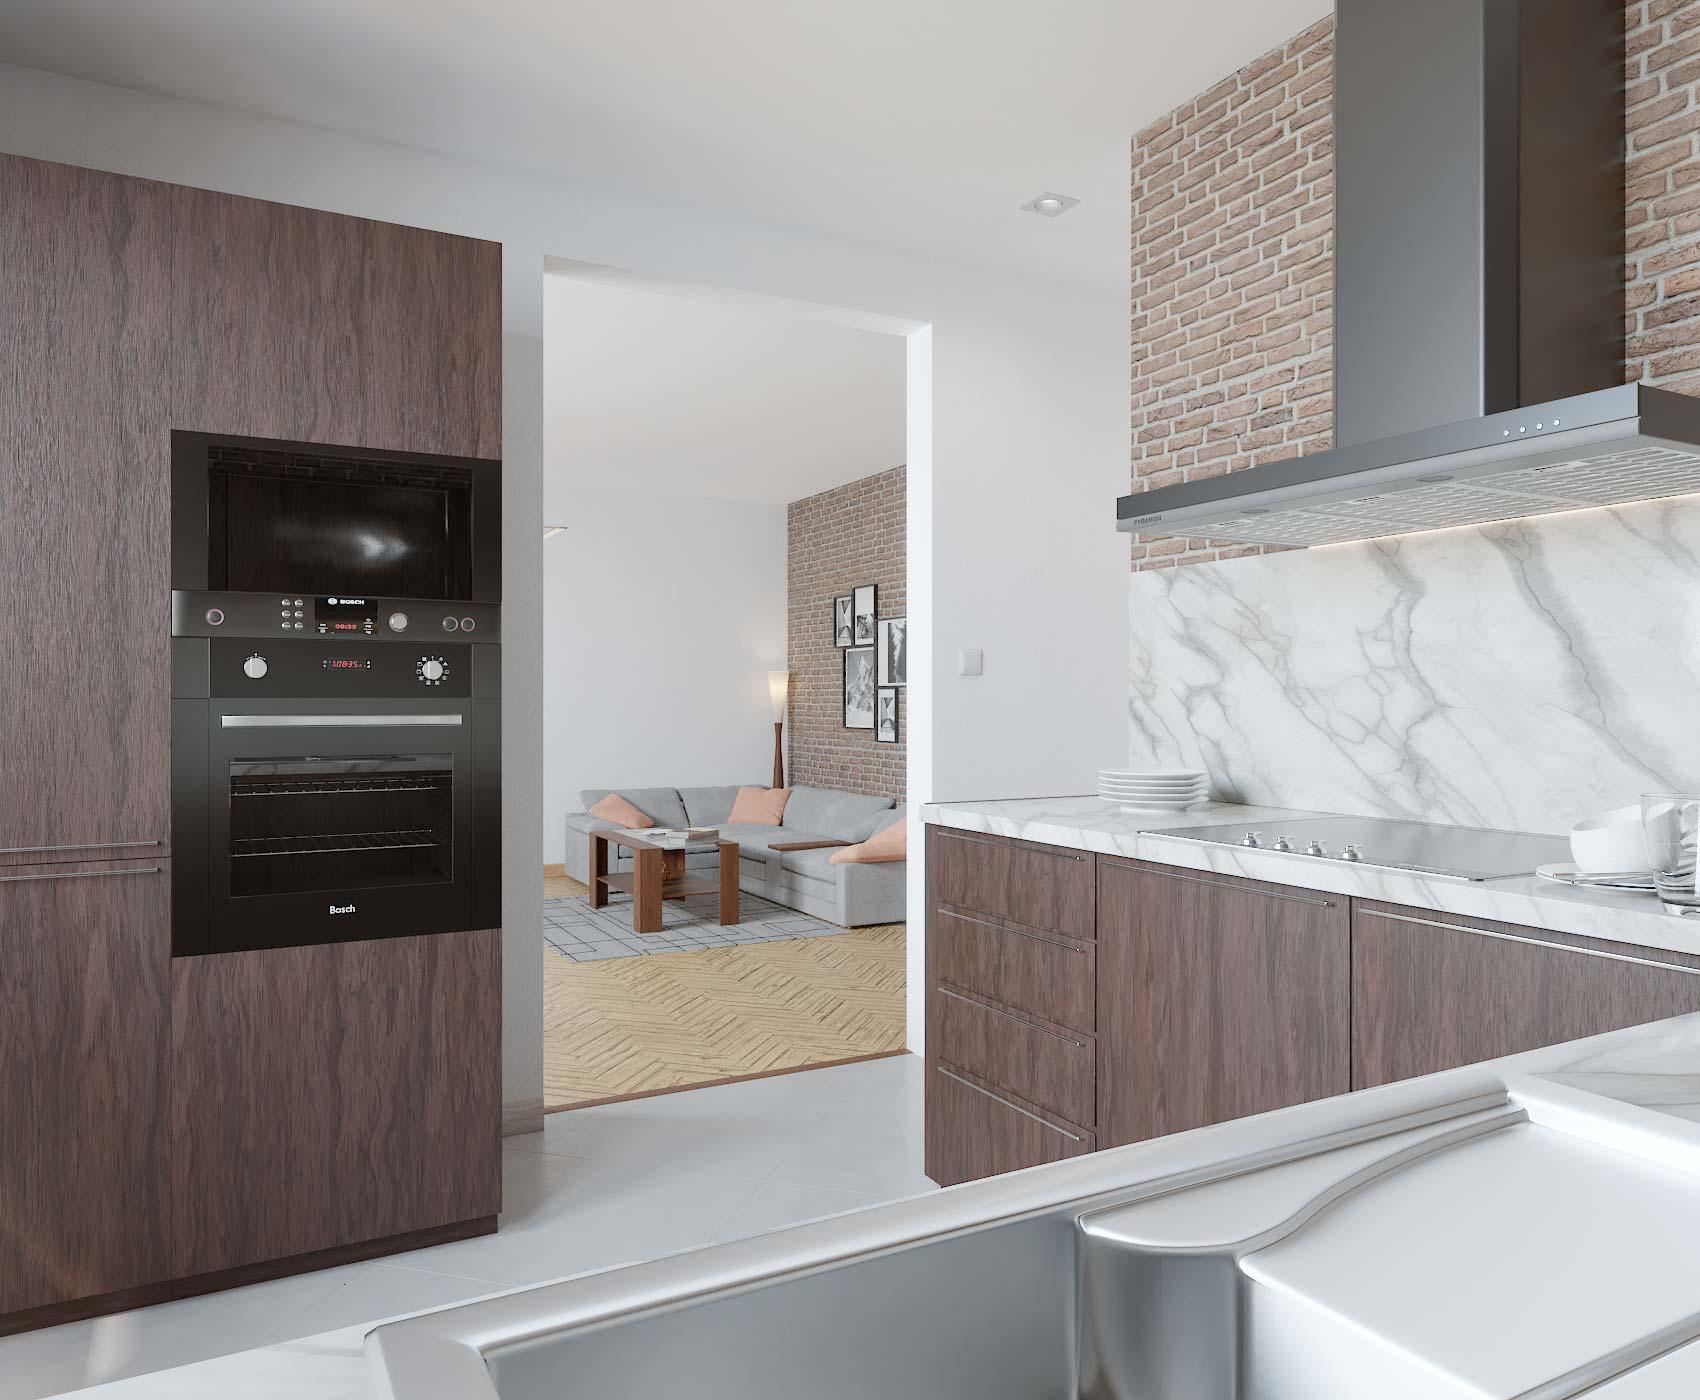 idea3d - vizualizácia kuchyňa 3